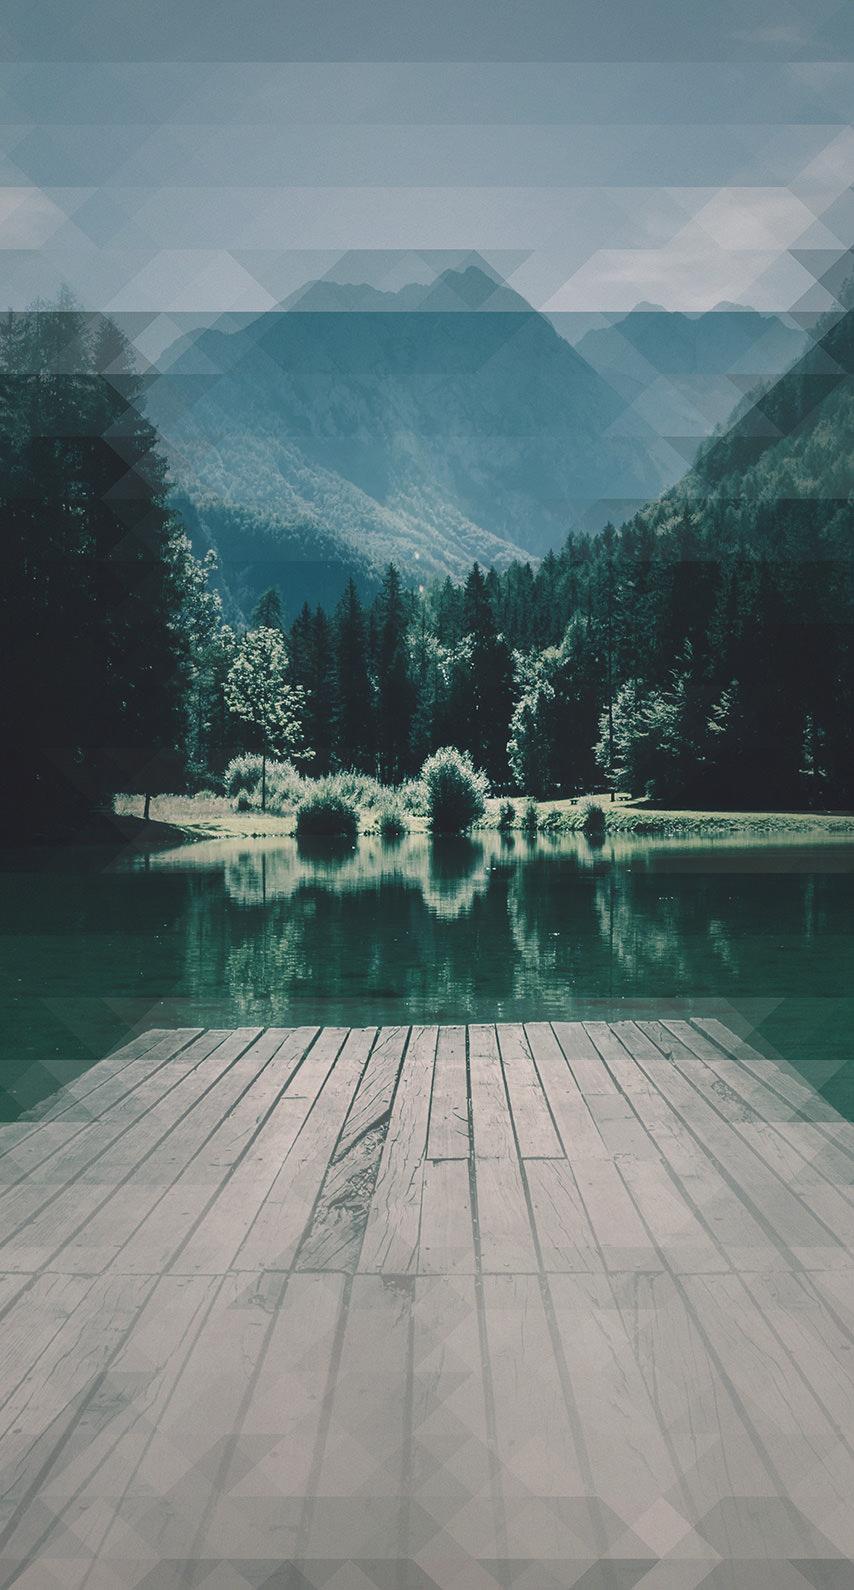 Landscape Lake Pier Green Blue Mountain Wallpaper Sc Iphone7